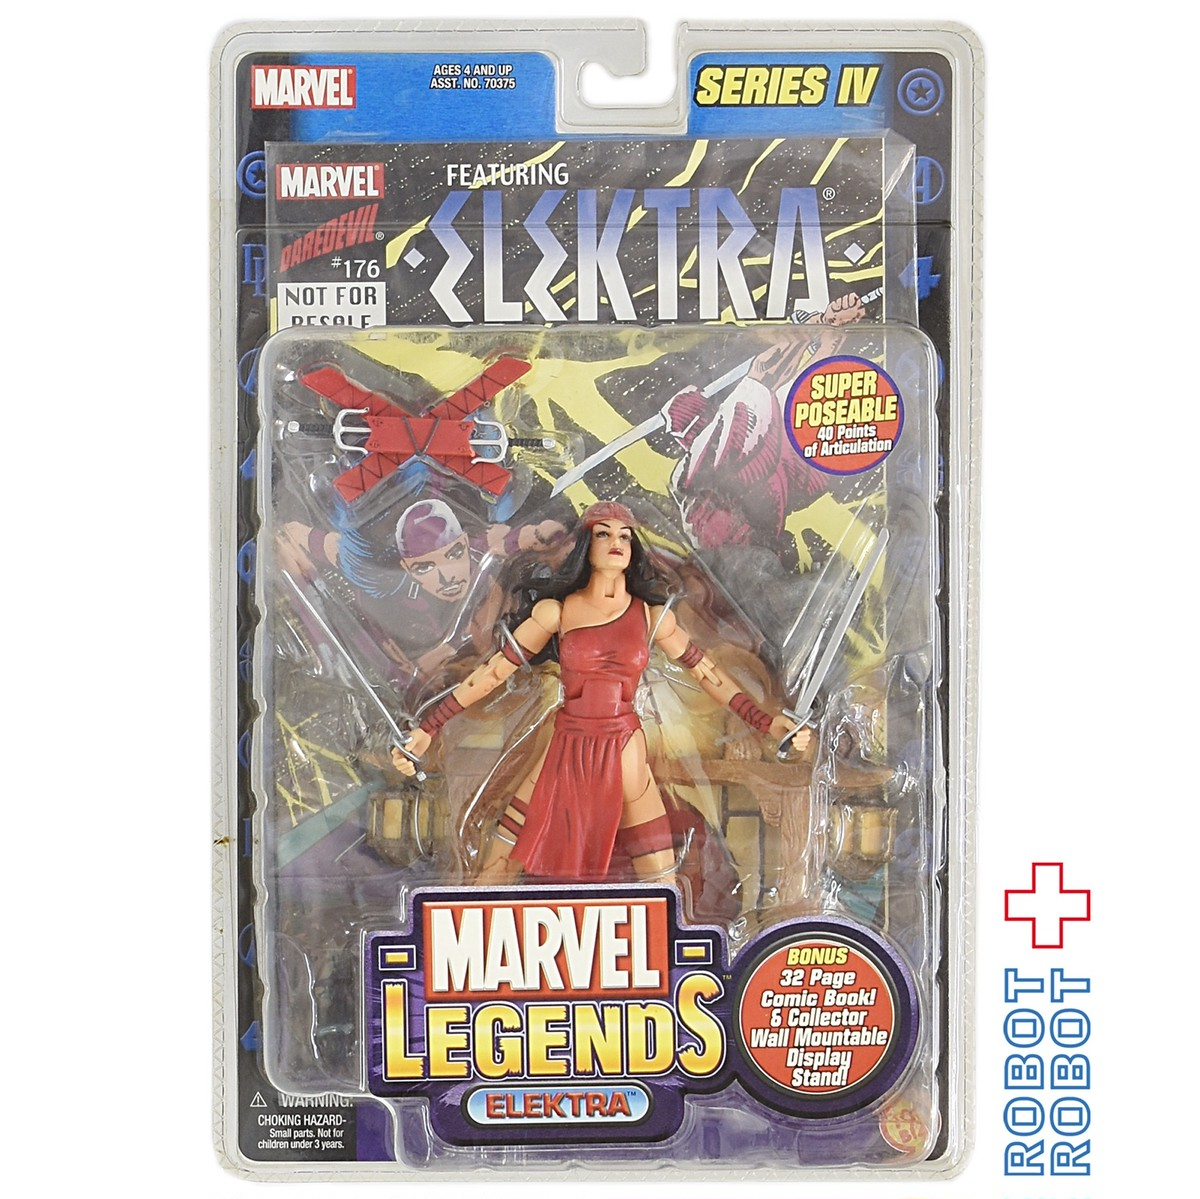 2002 ToyBiz Marvel Legends Series IV 4 ELEKTRA Figure MOC w// Comic